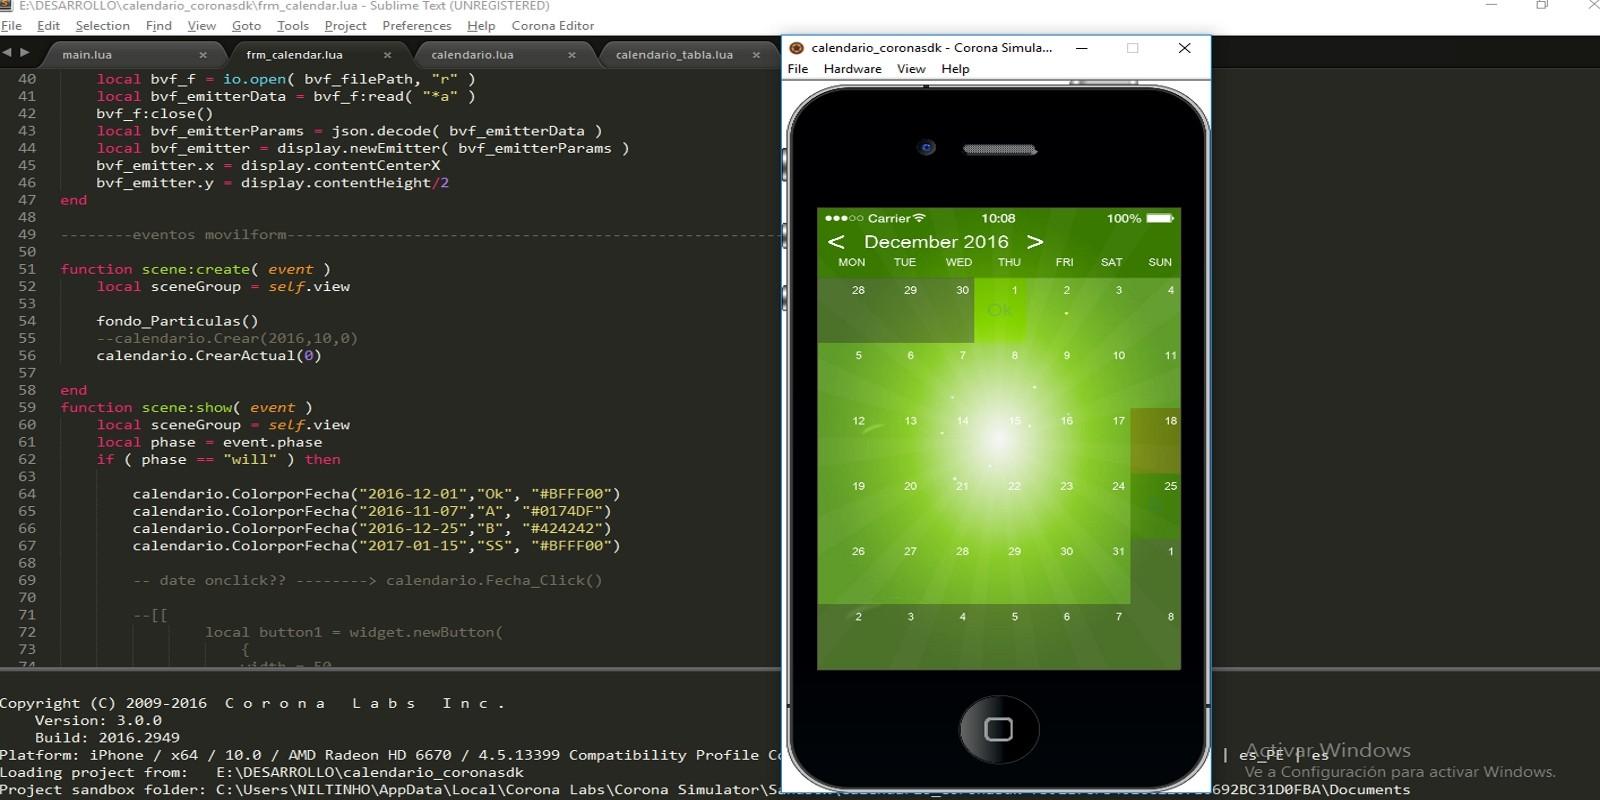 titanium app templates - calendar corona sdk app template codester